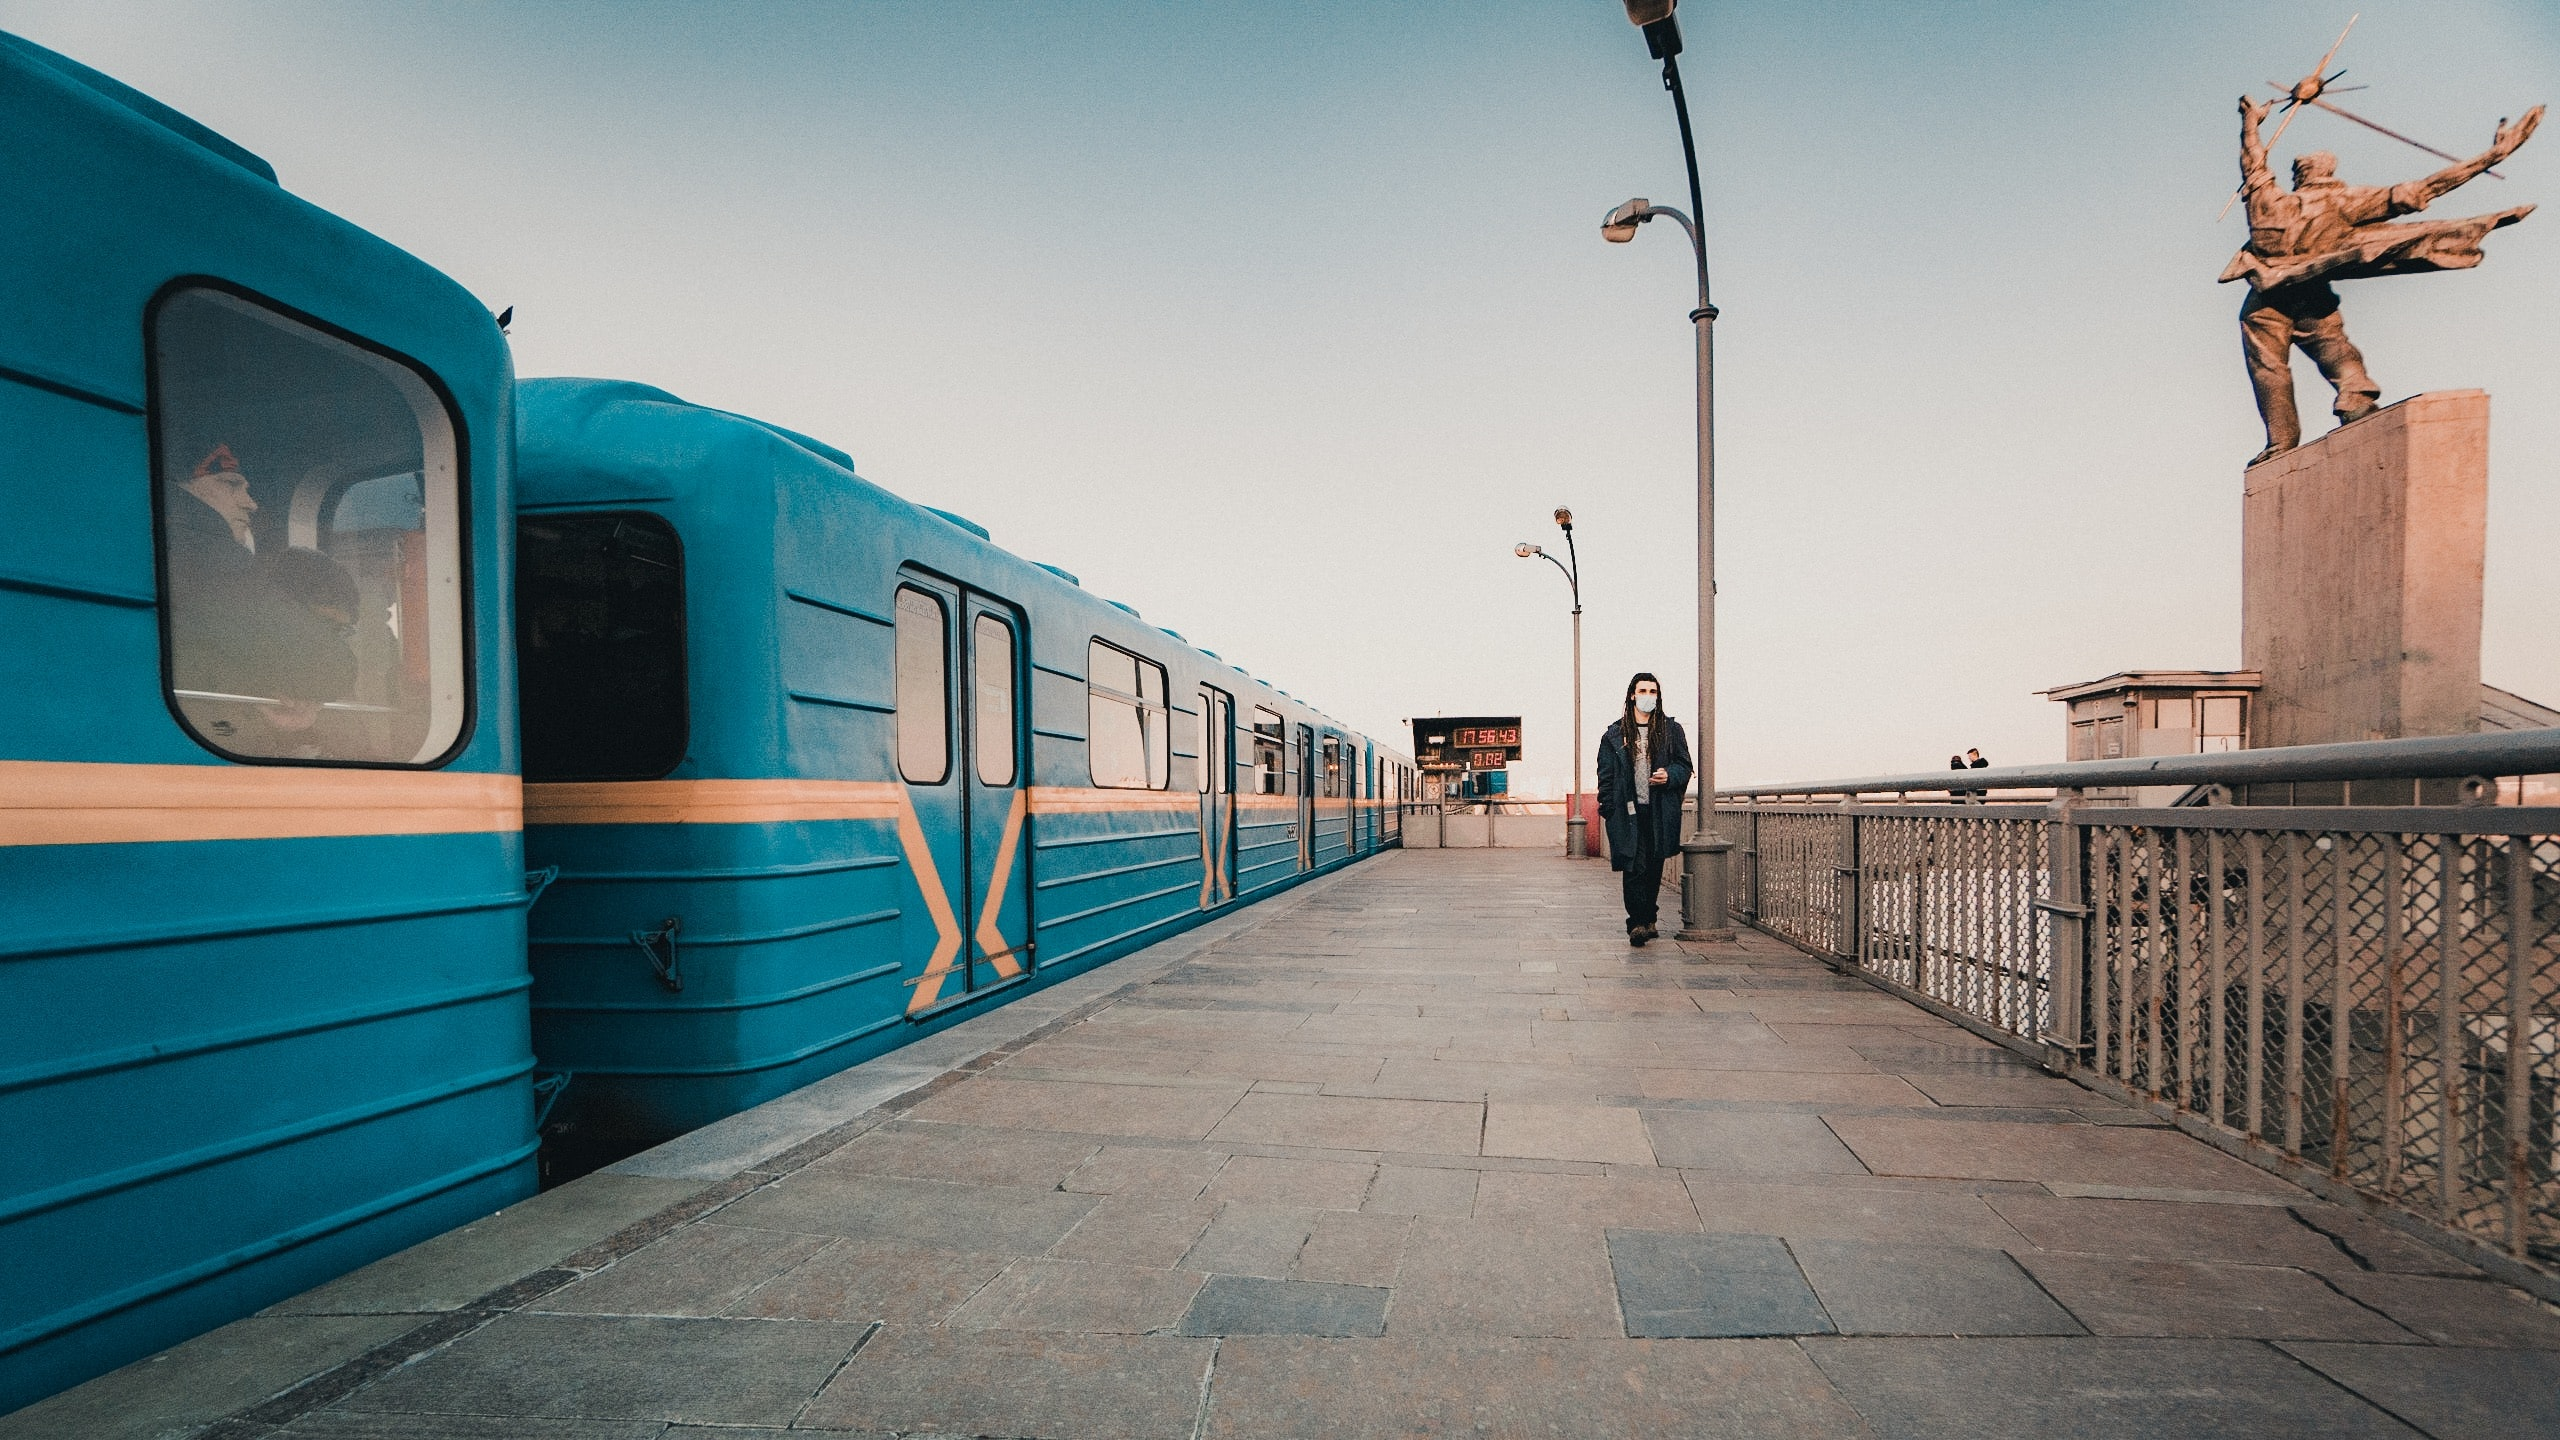 person walking near blue train during daytime